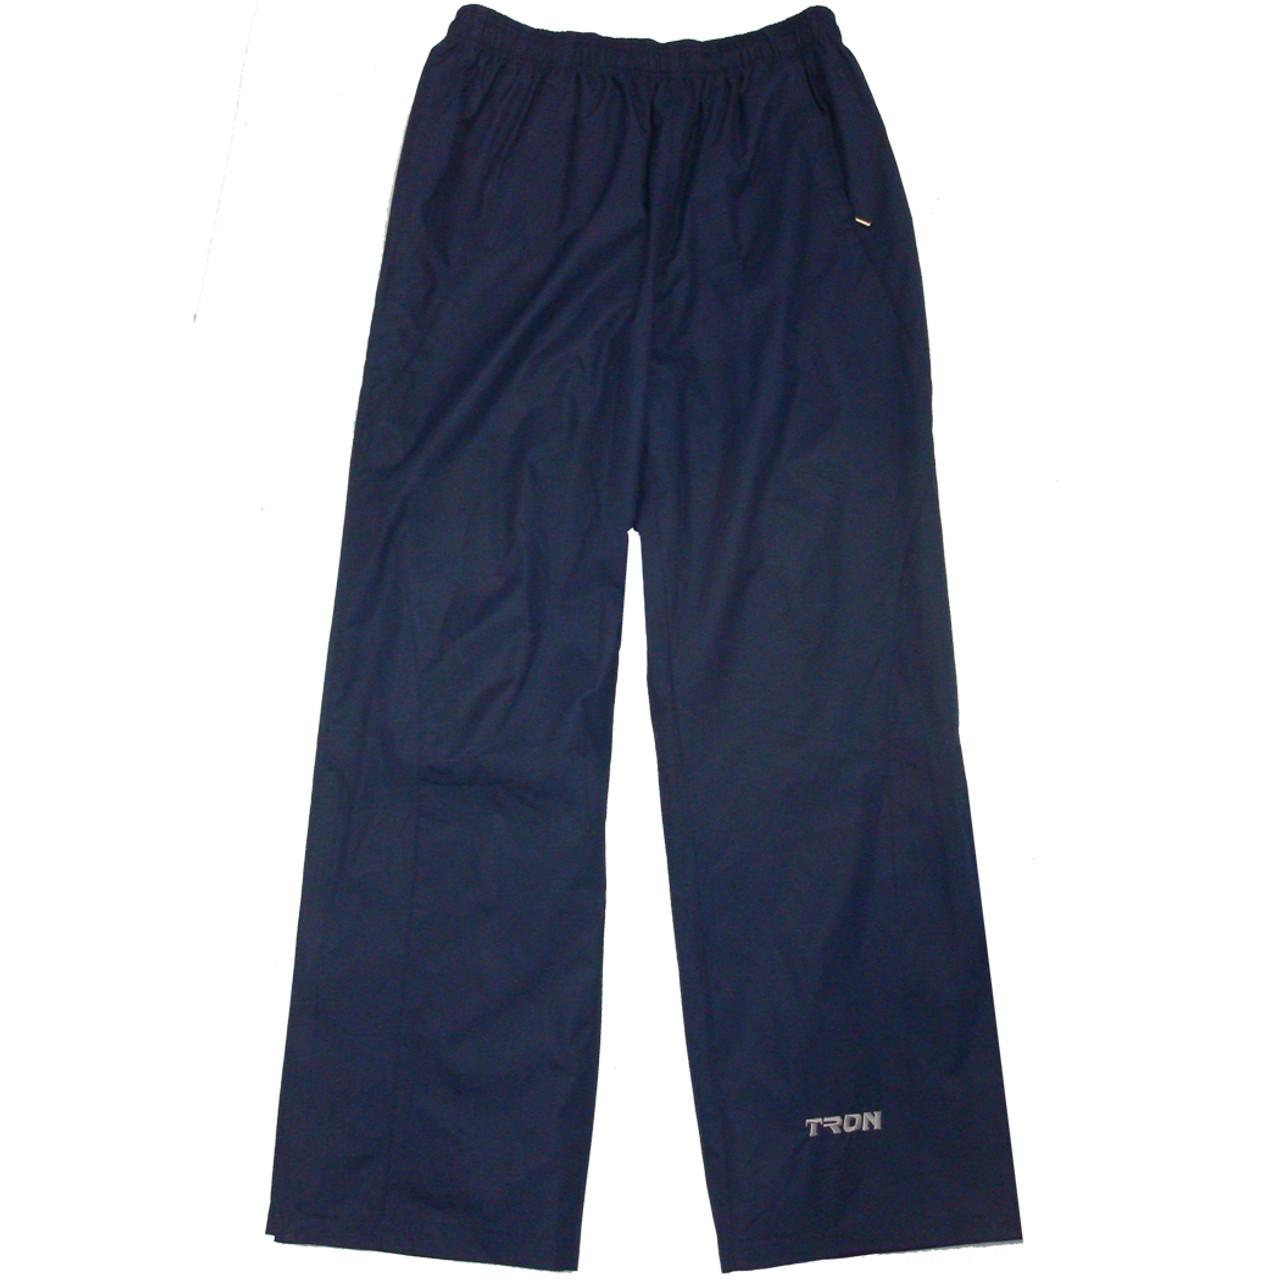 Tron WP300 Warm-Up Pants